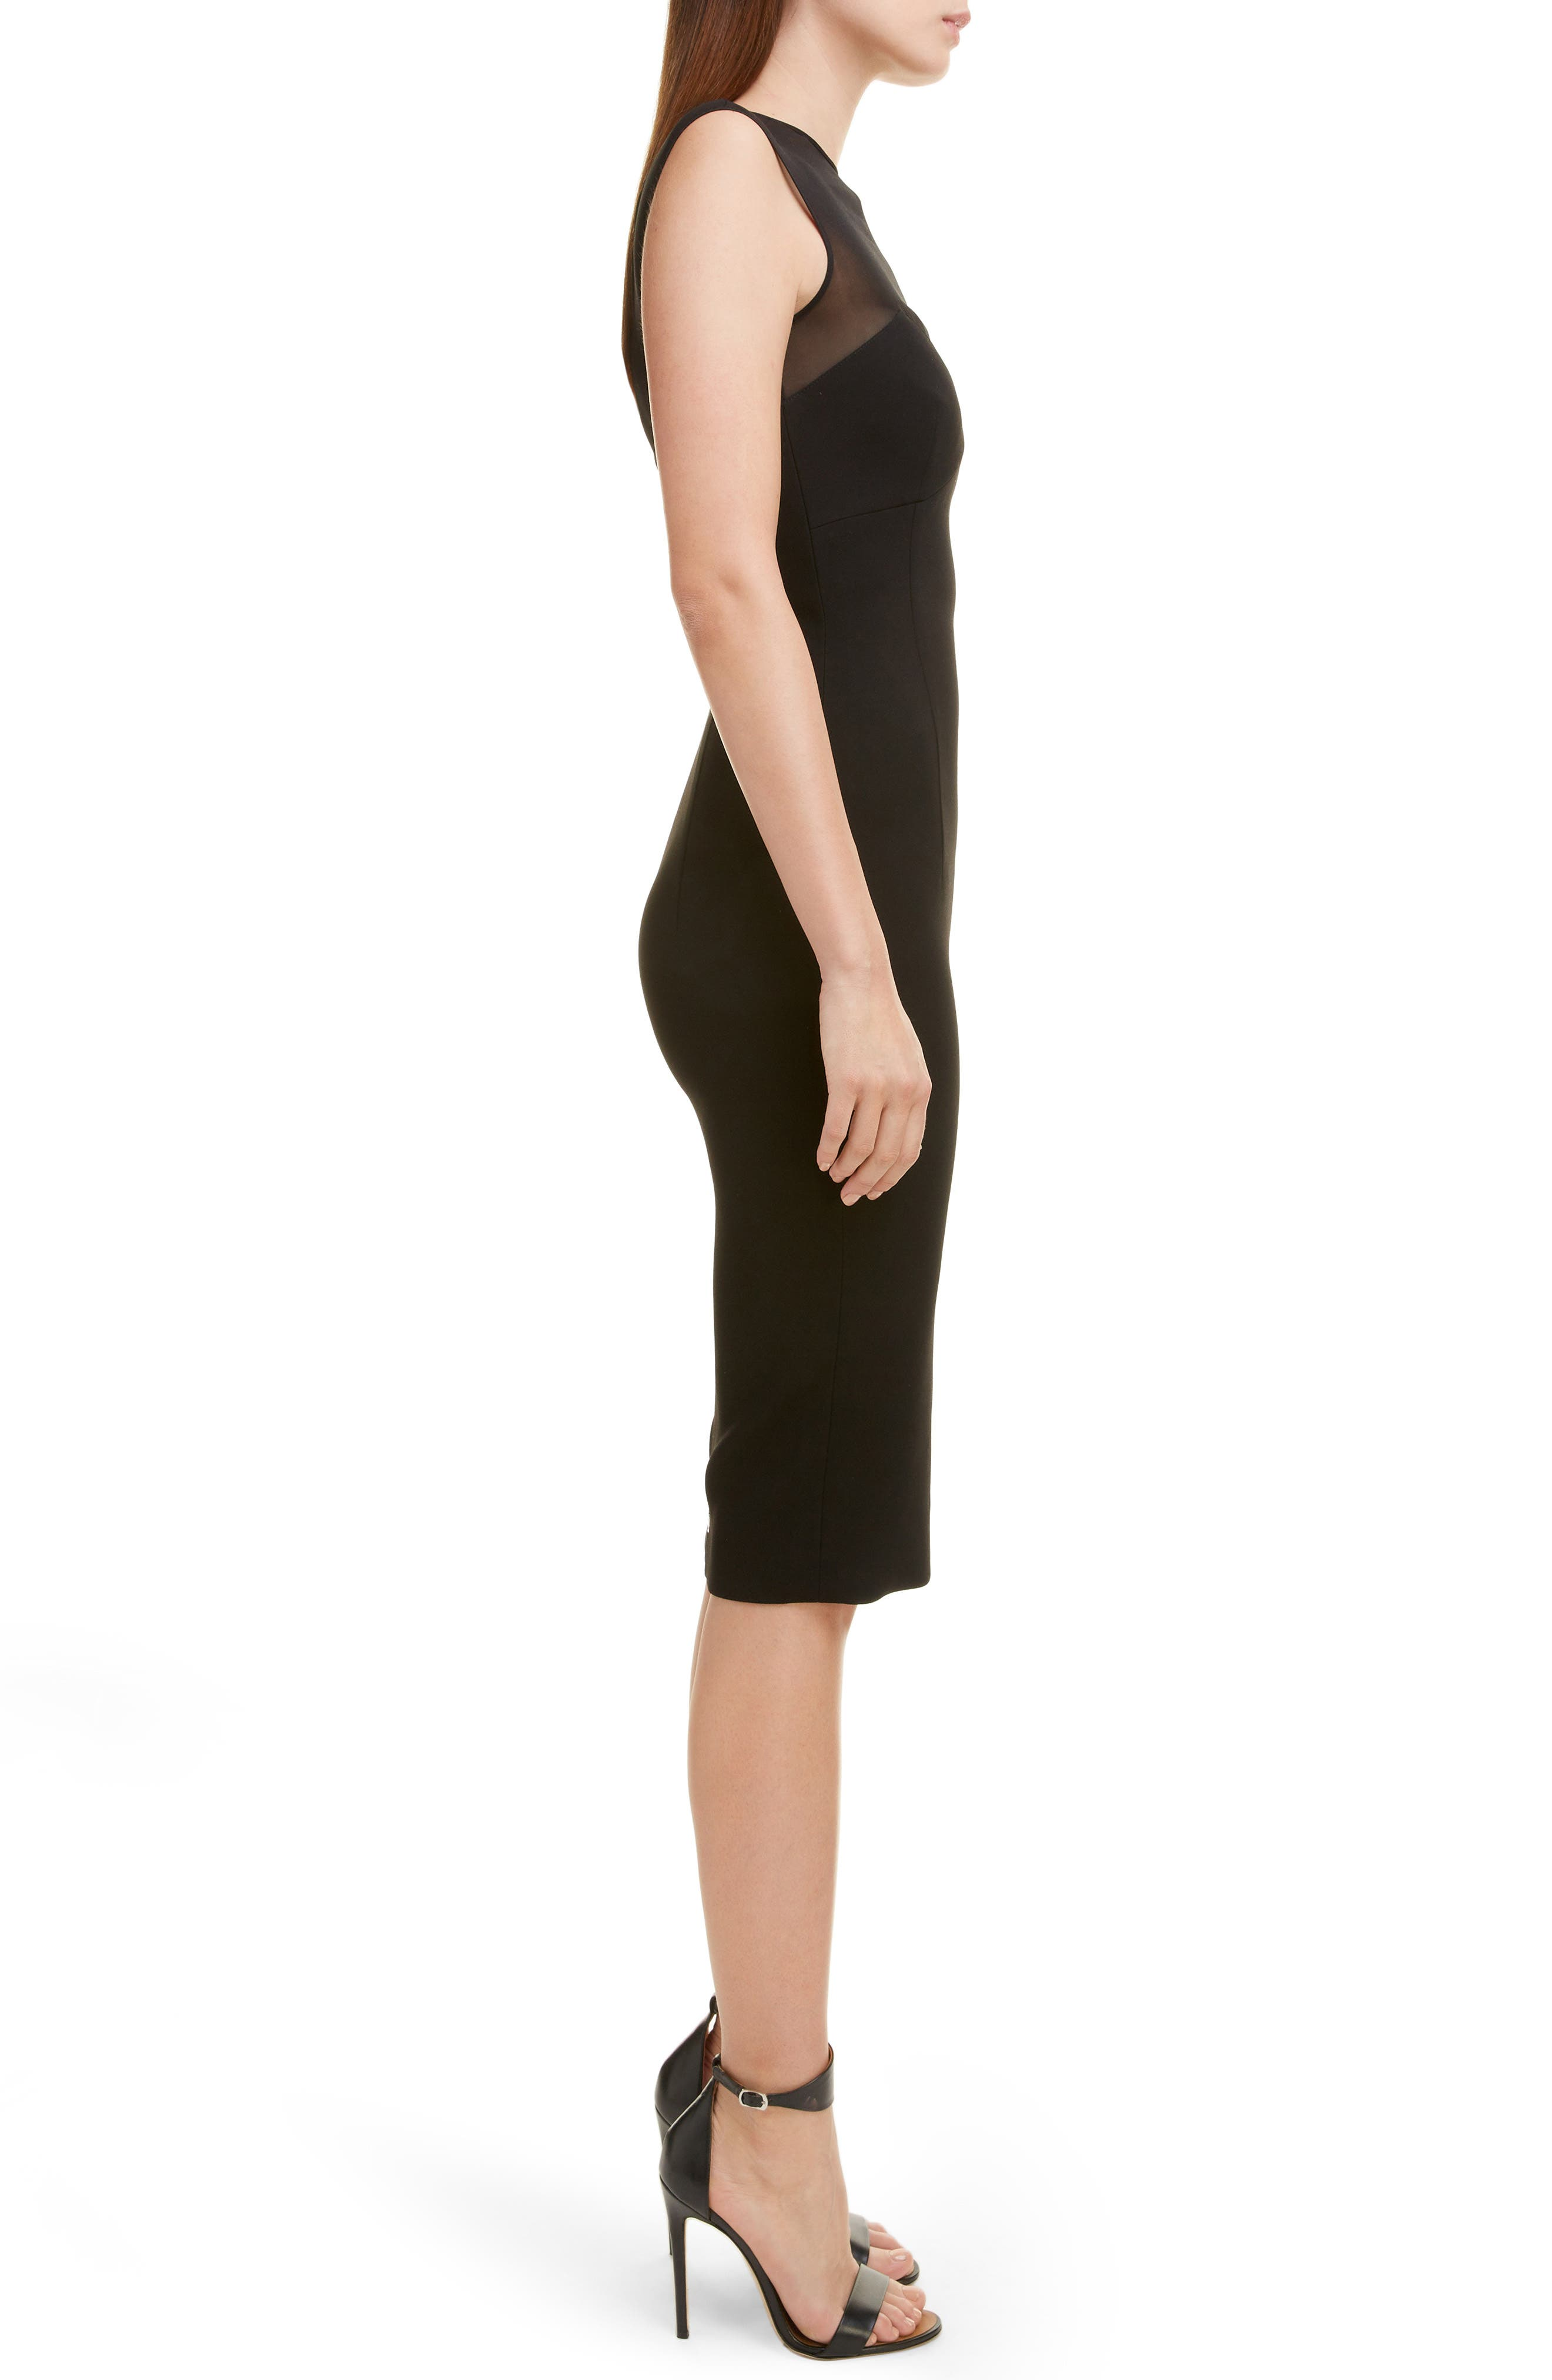 VICTORIA BECKHAM, Sheer Yoke Sheath Dress, Alternate thumbnail 3, color, BLACK